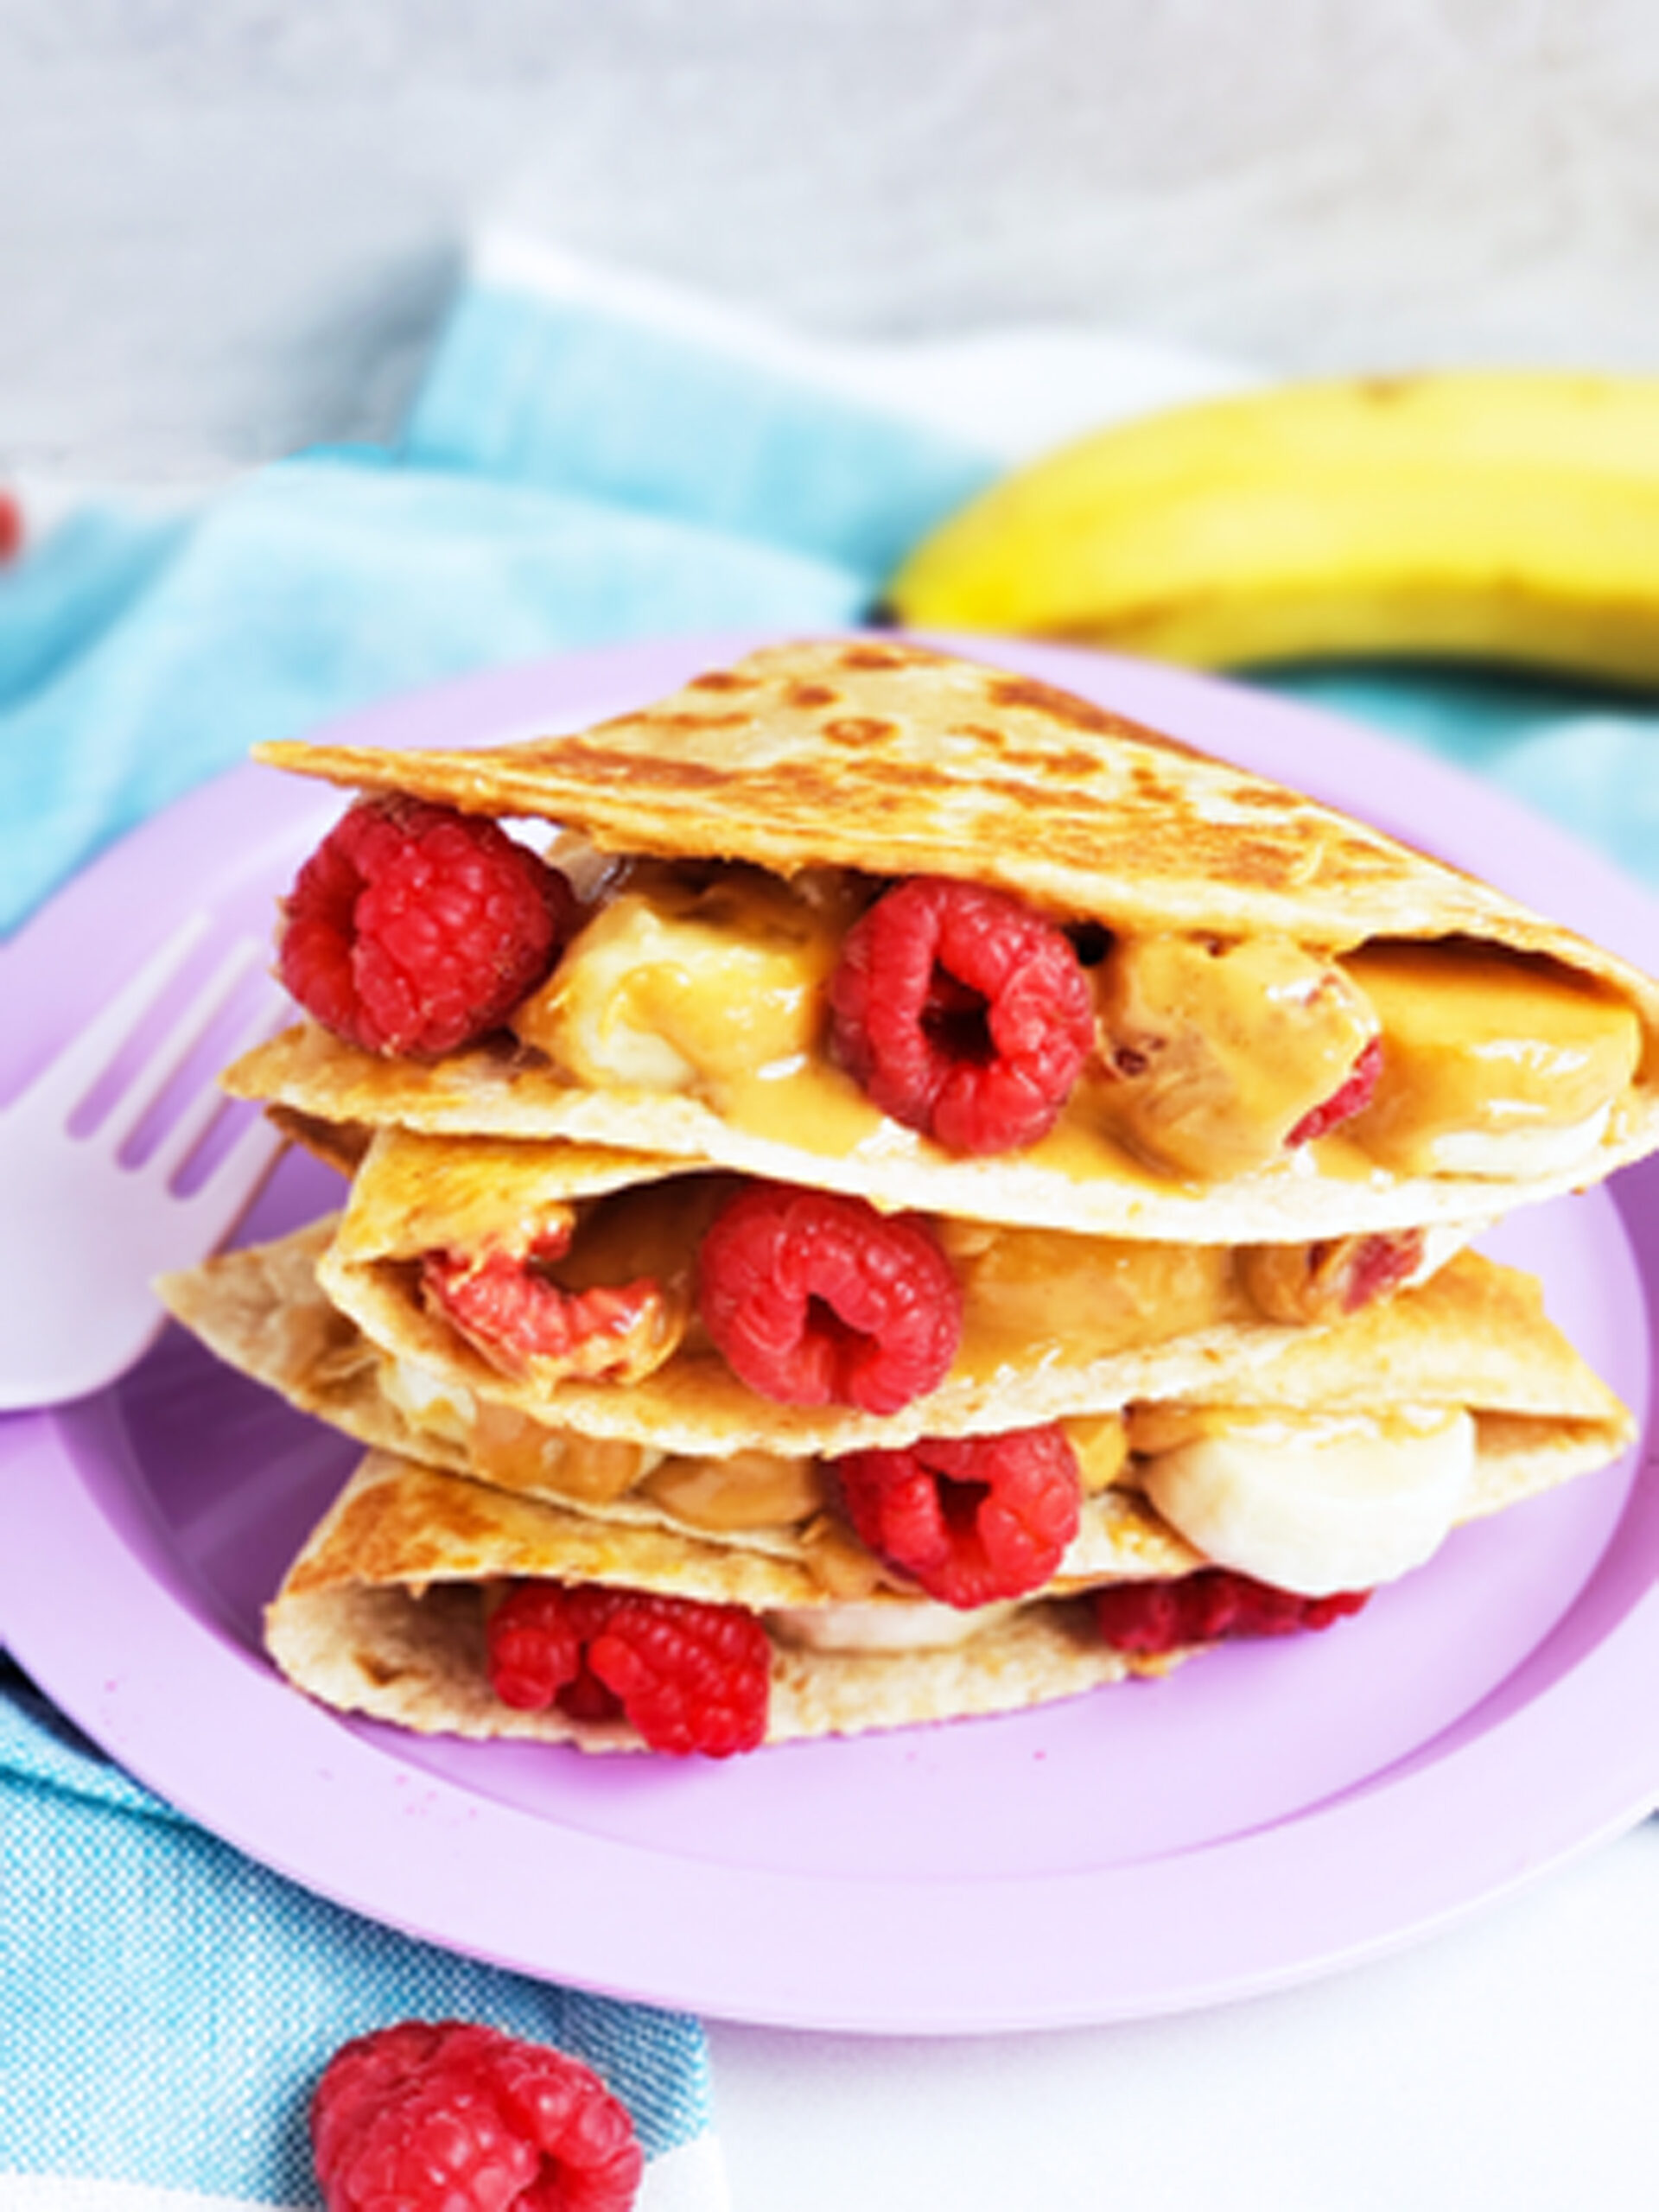 Raspberry, Banana, & Peanut Butter Quesadillas